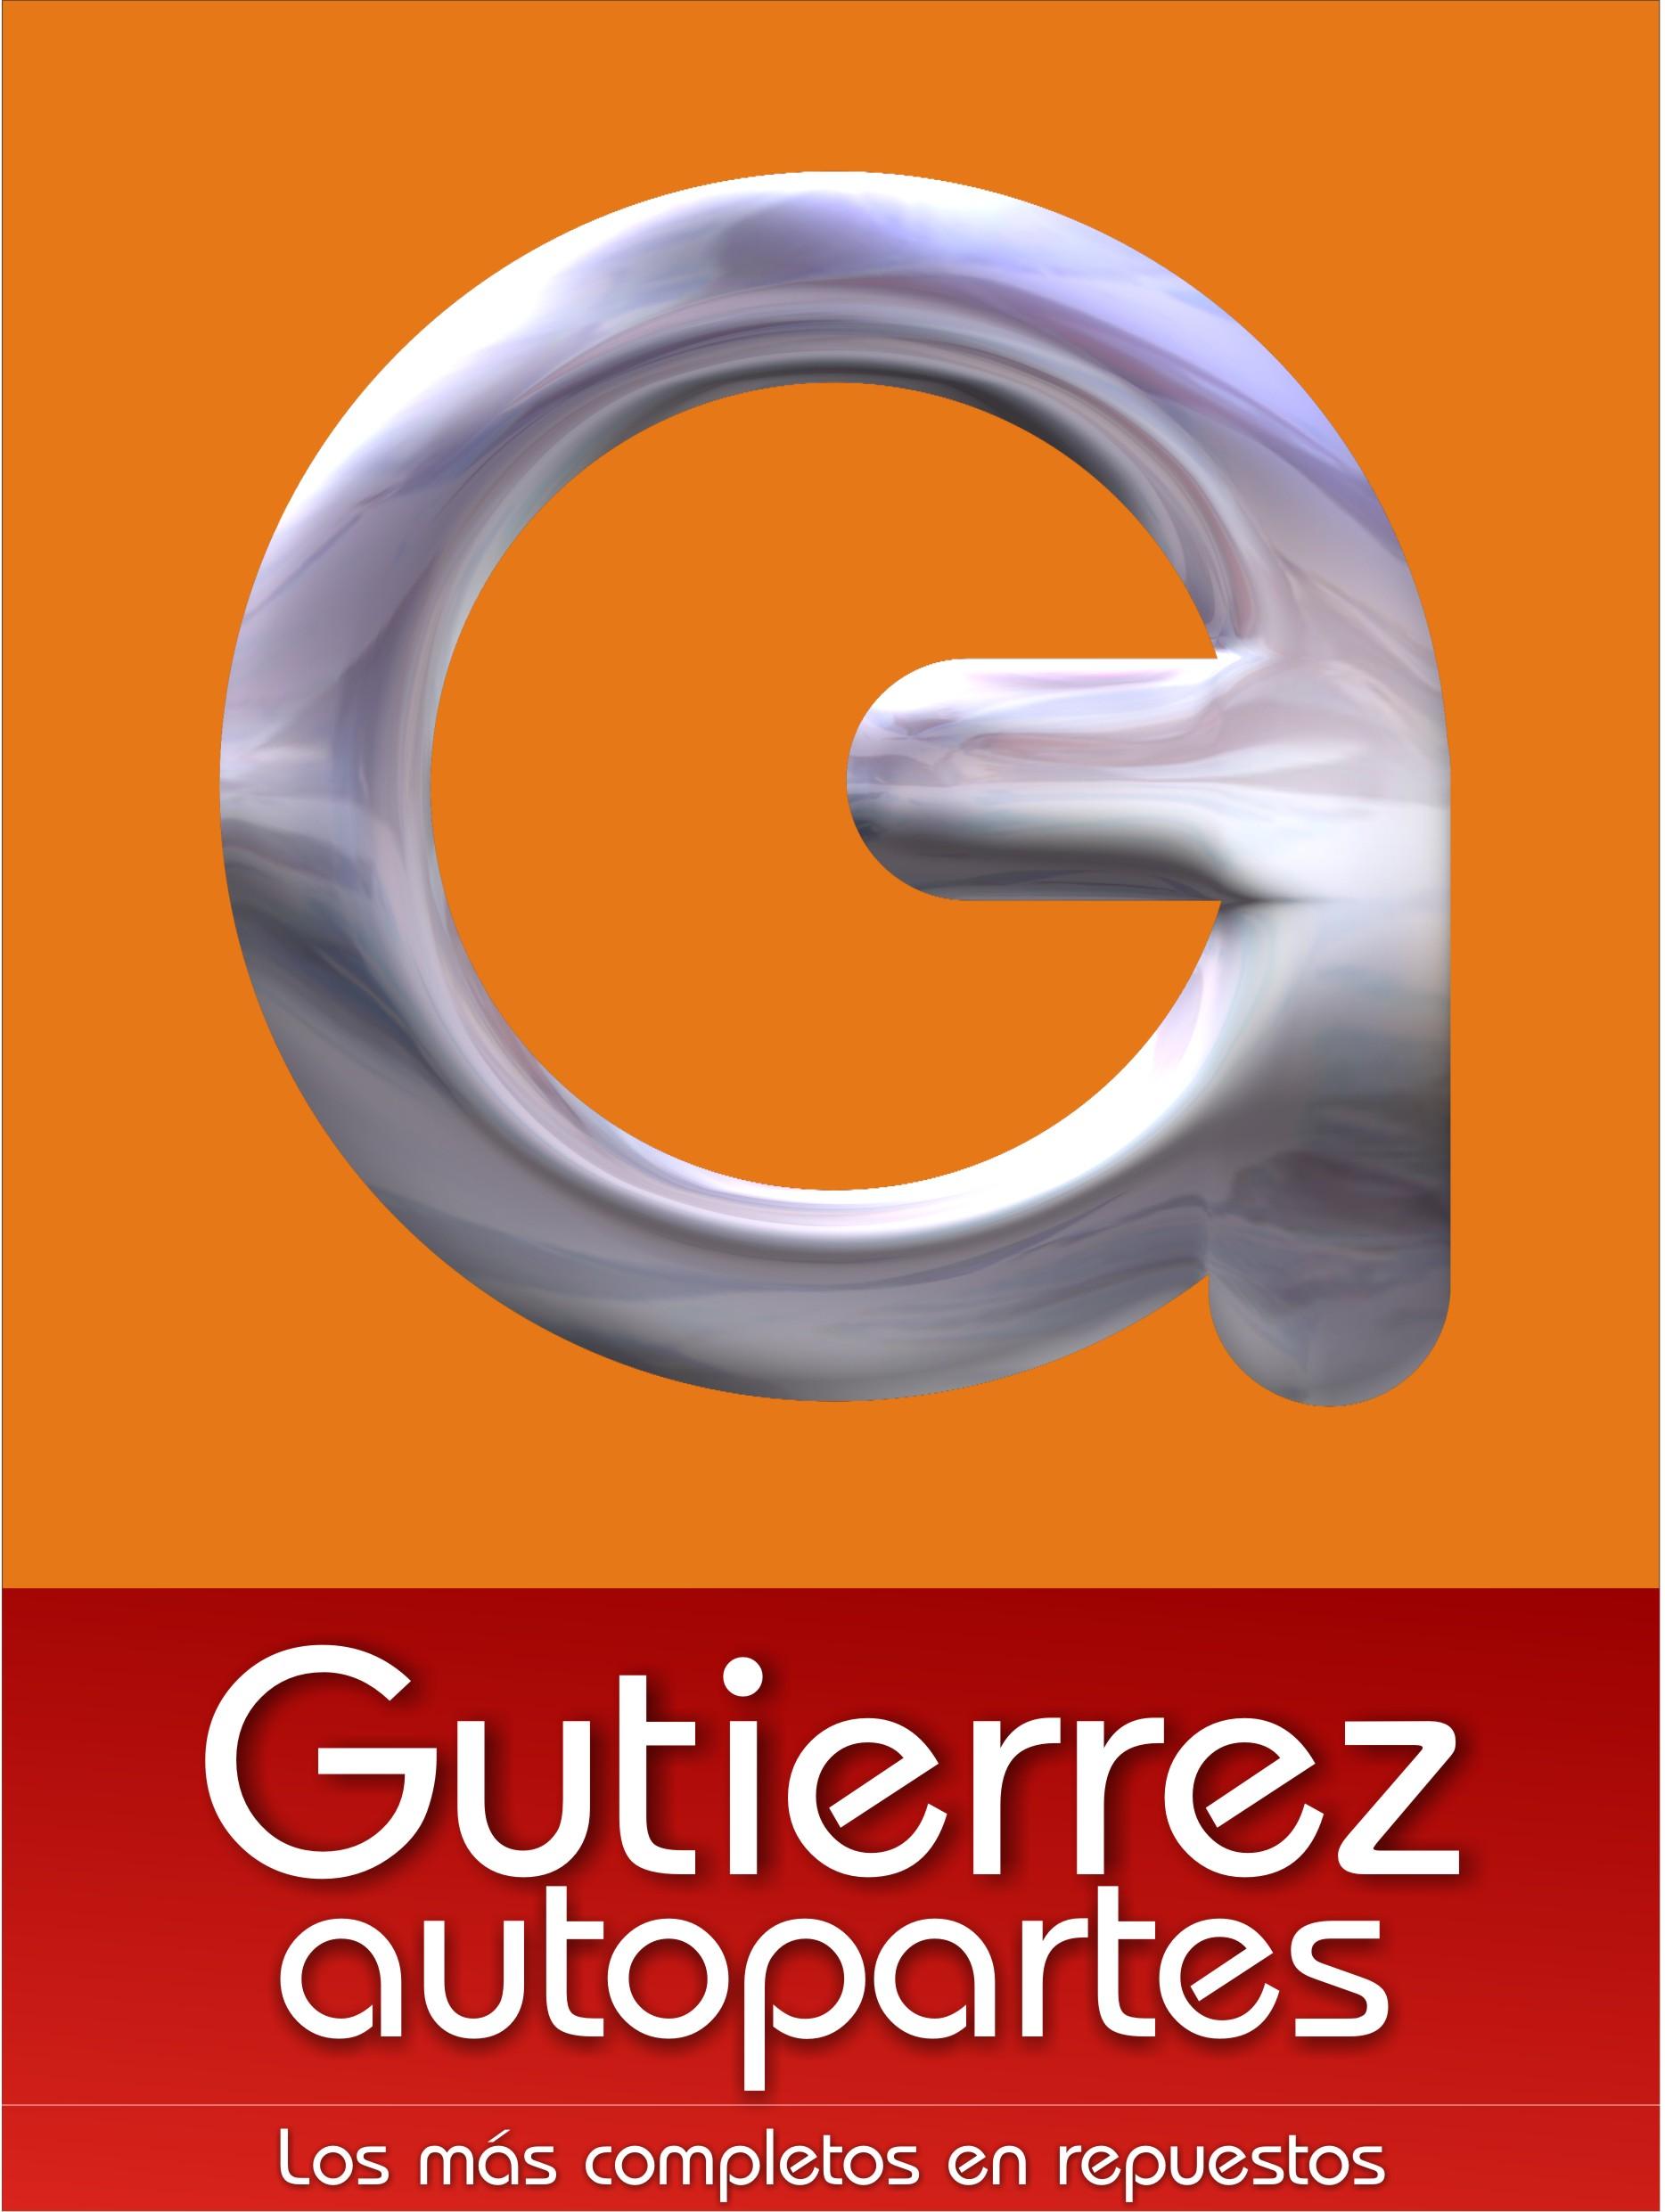 Simbolo Gutierrez